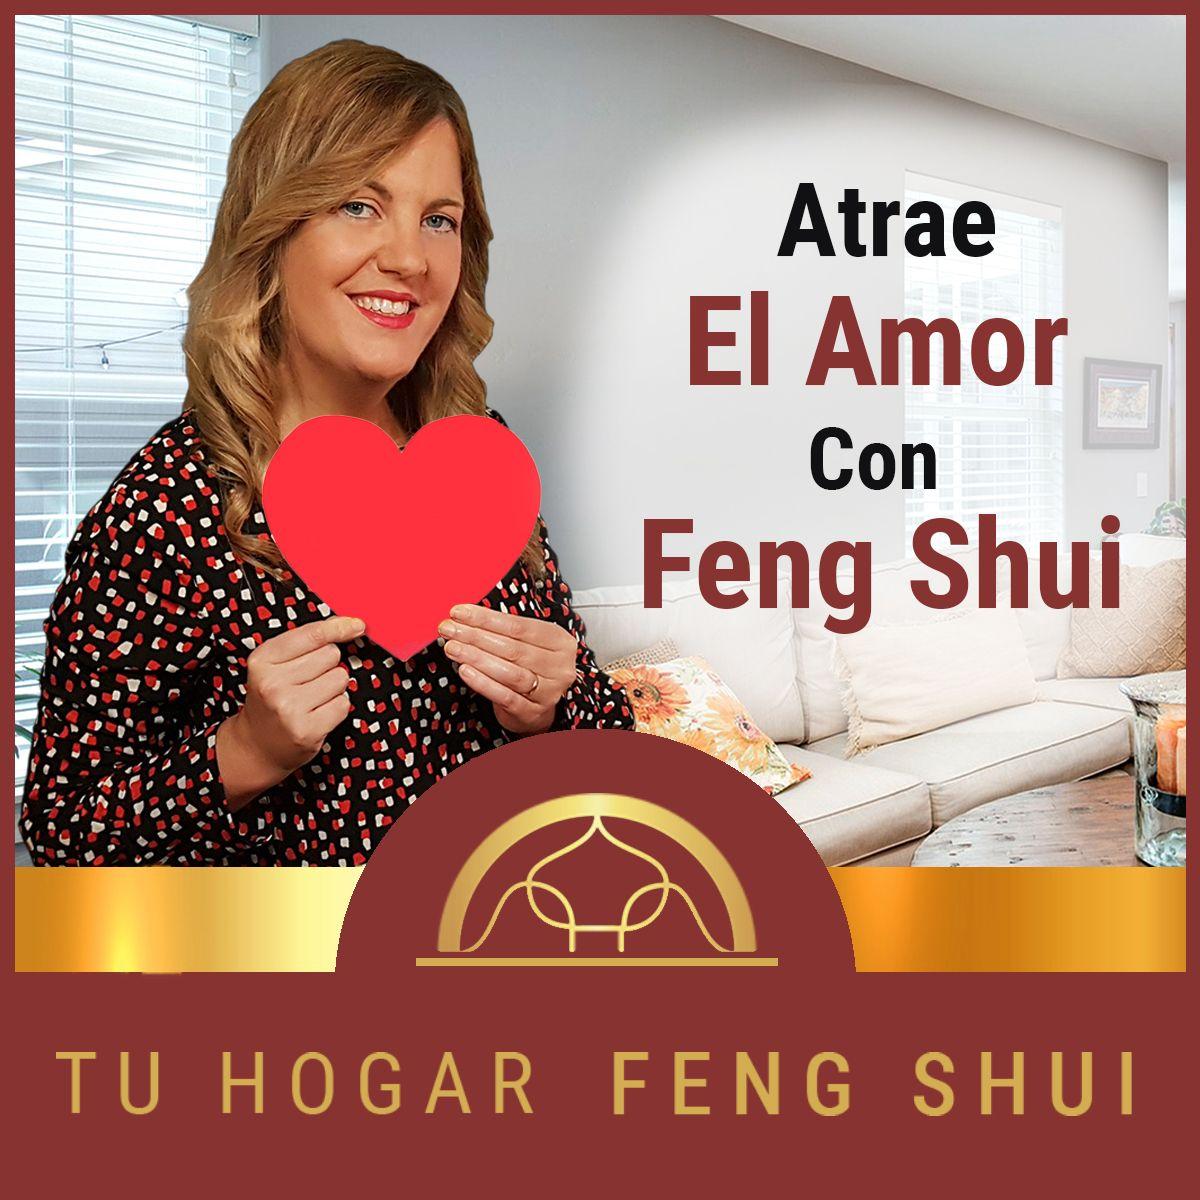 Como Encontrar El Amor Segun El Feng Shui Pin De Tu Hogar Feng Shui En Video Consejos Feng Shui Hogar